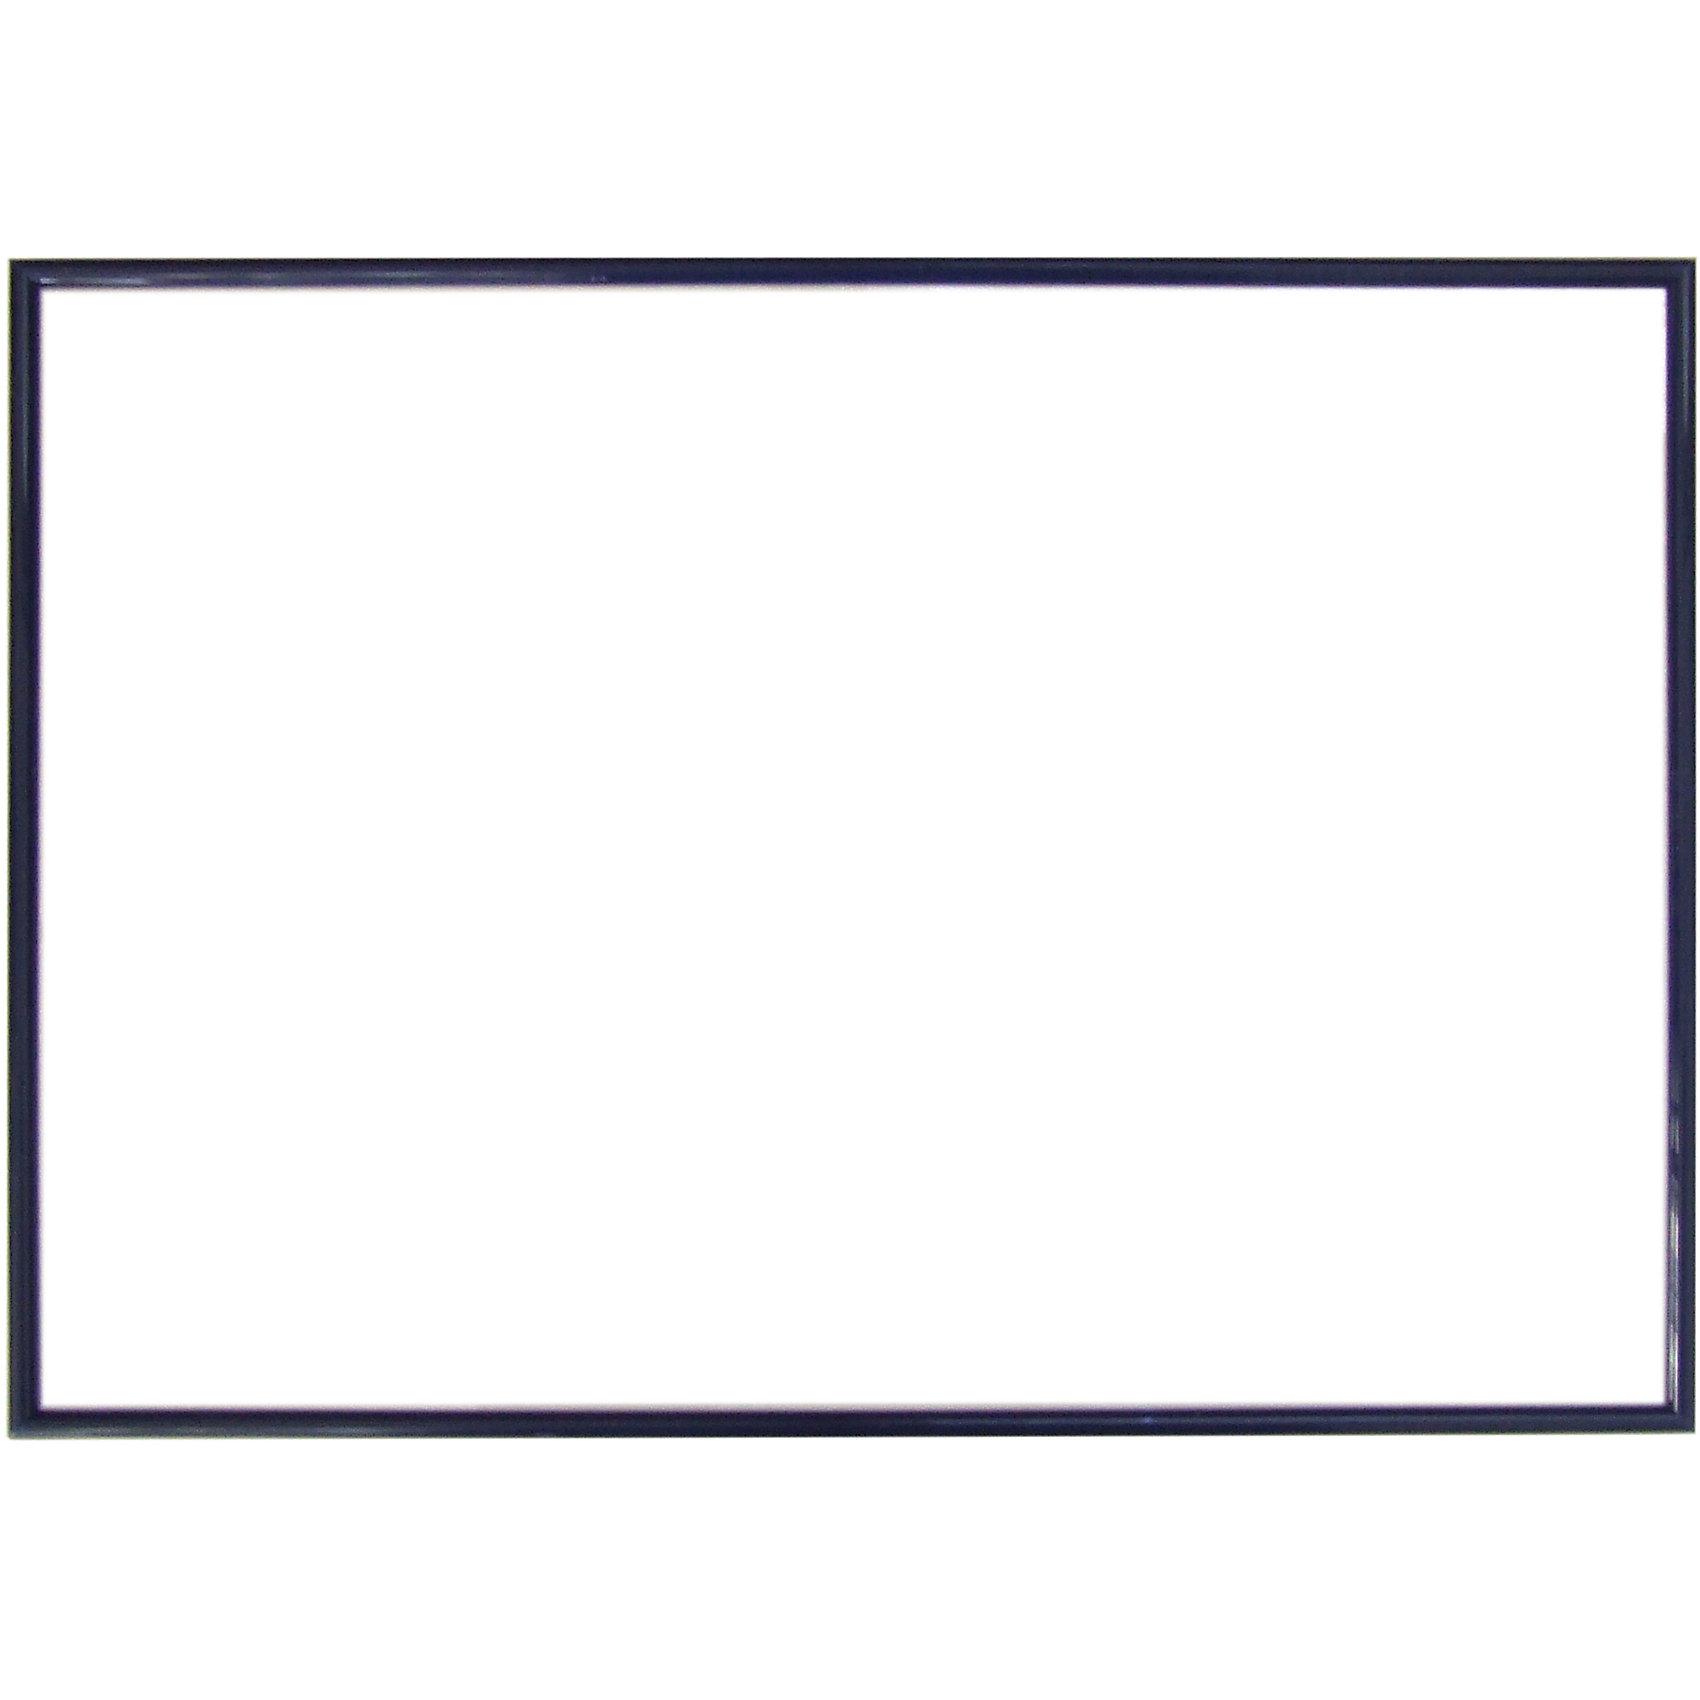 Рамка для пазла 500 деталей, 35х50 см, синяя